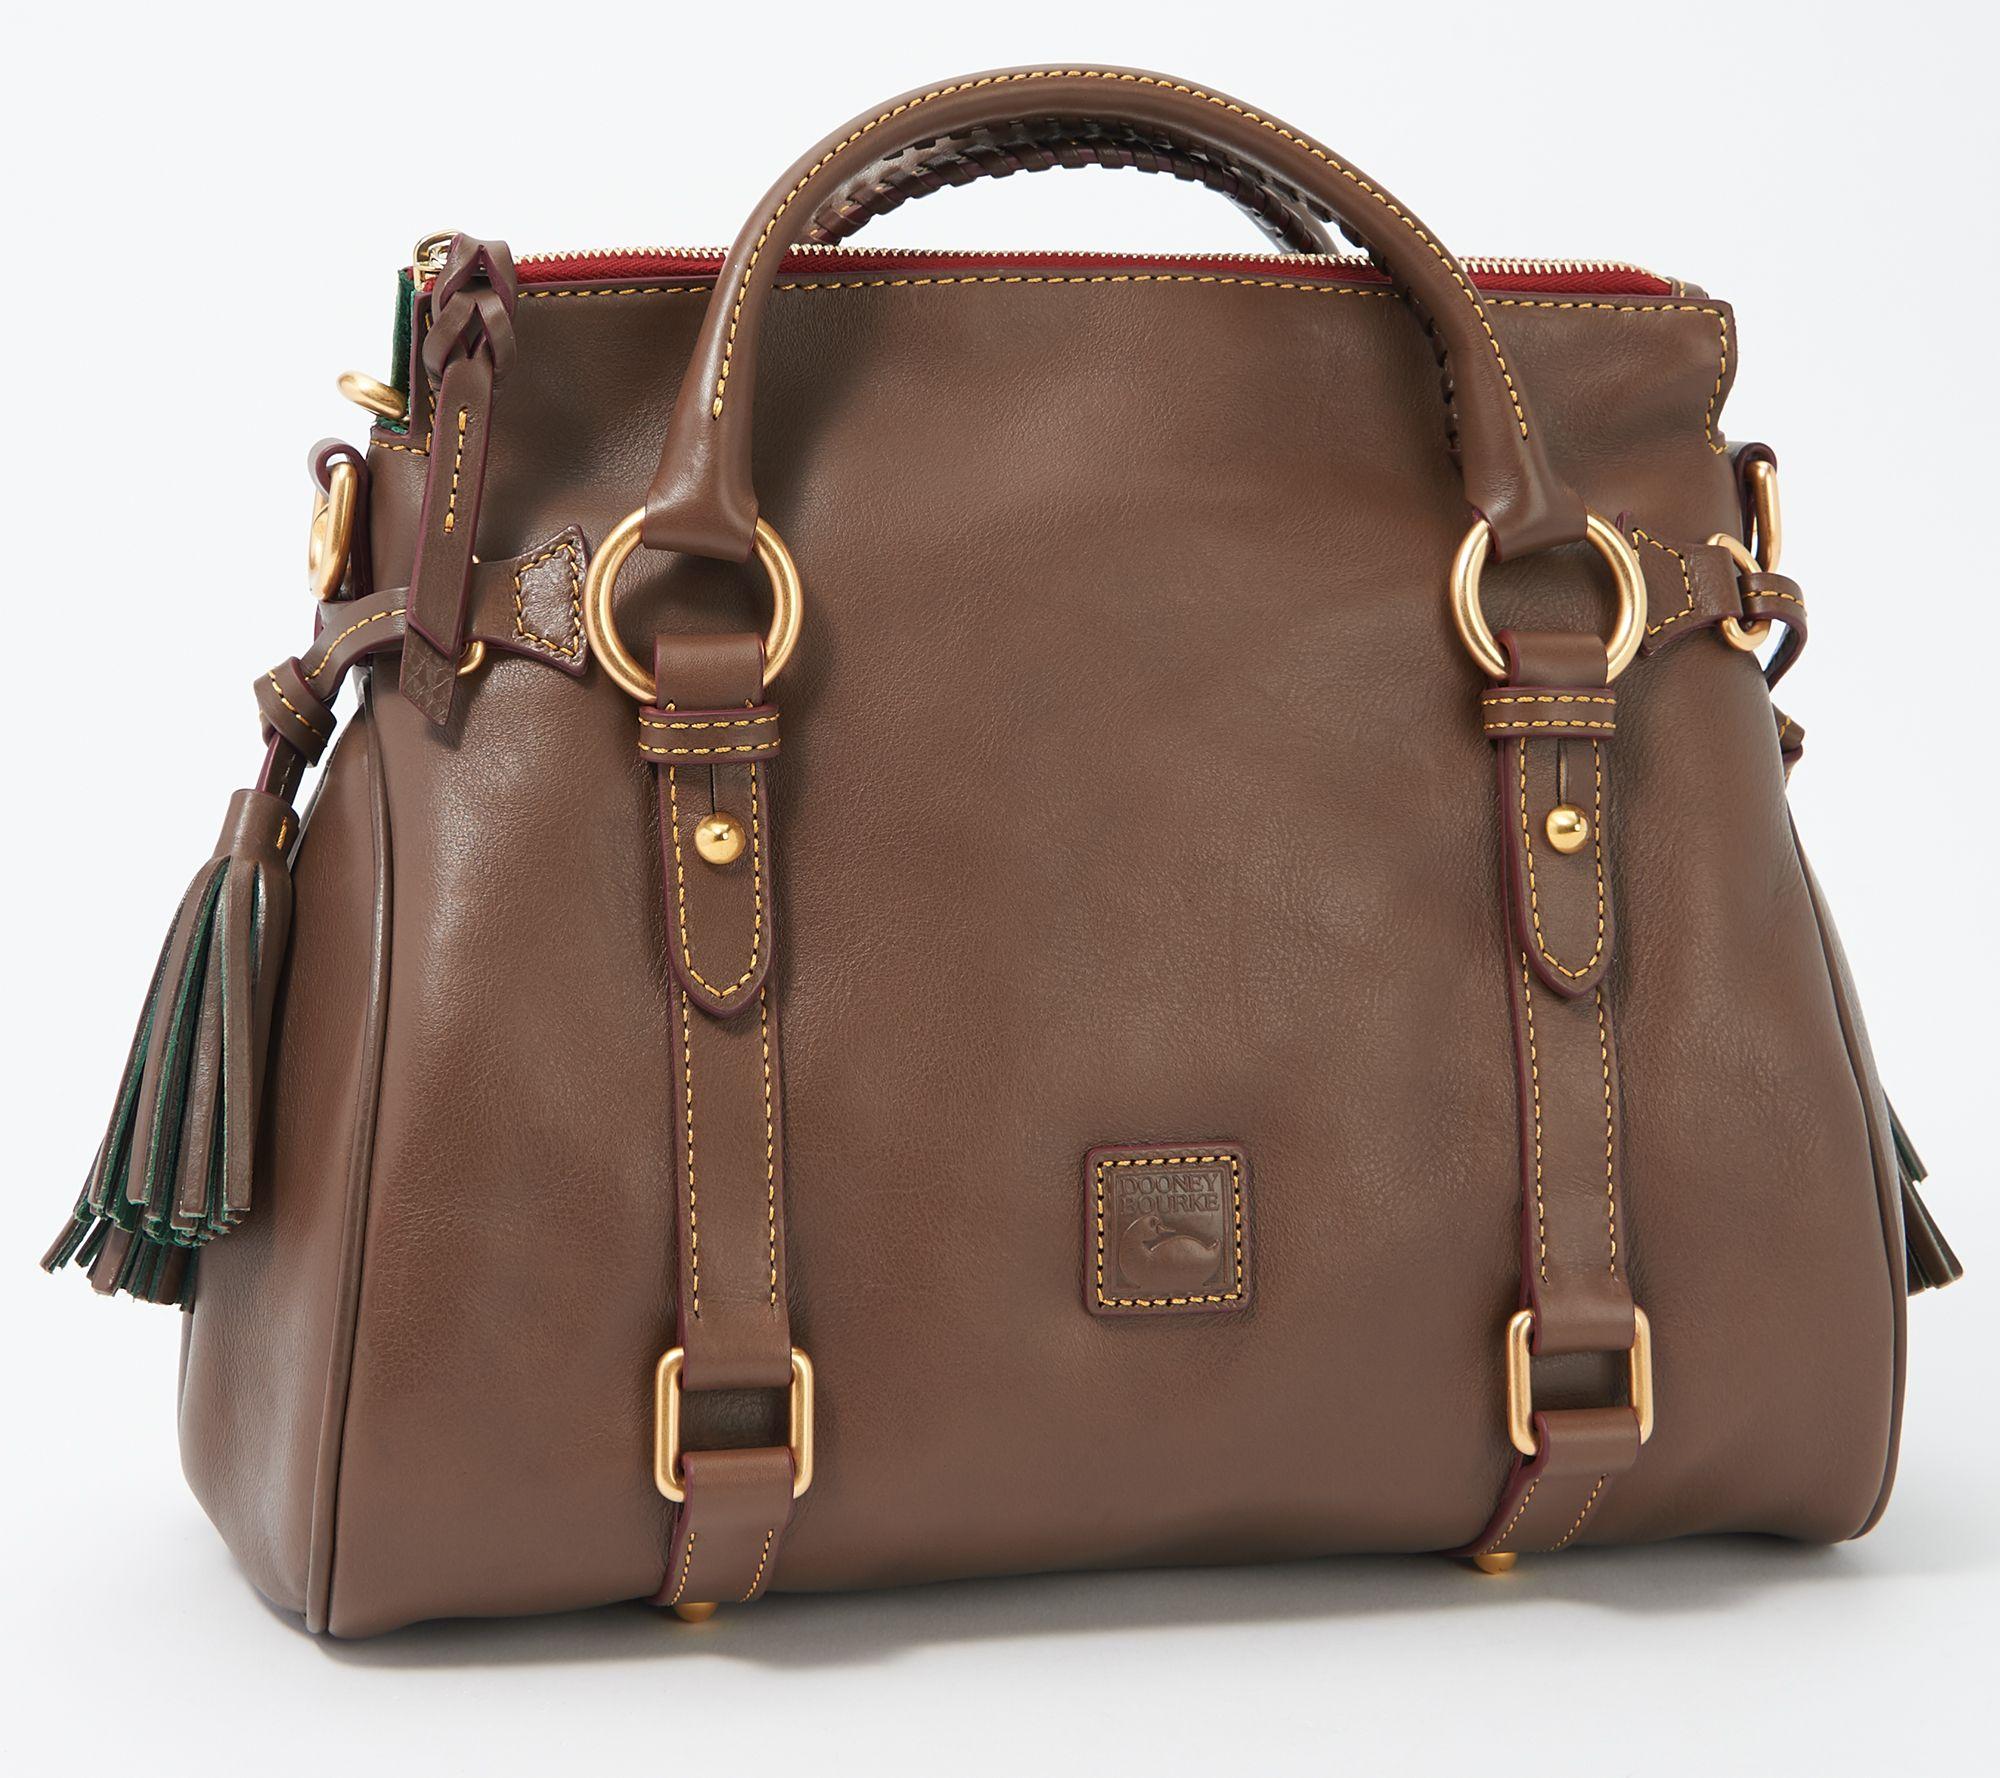 d61765524724 Dooney & Bourke Florentine Leather Medium Satchel — QVC.com